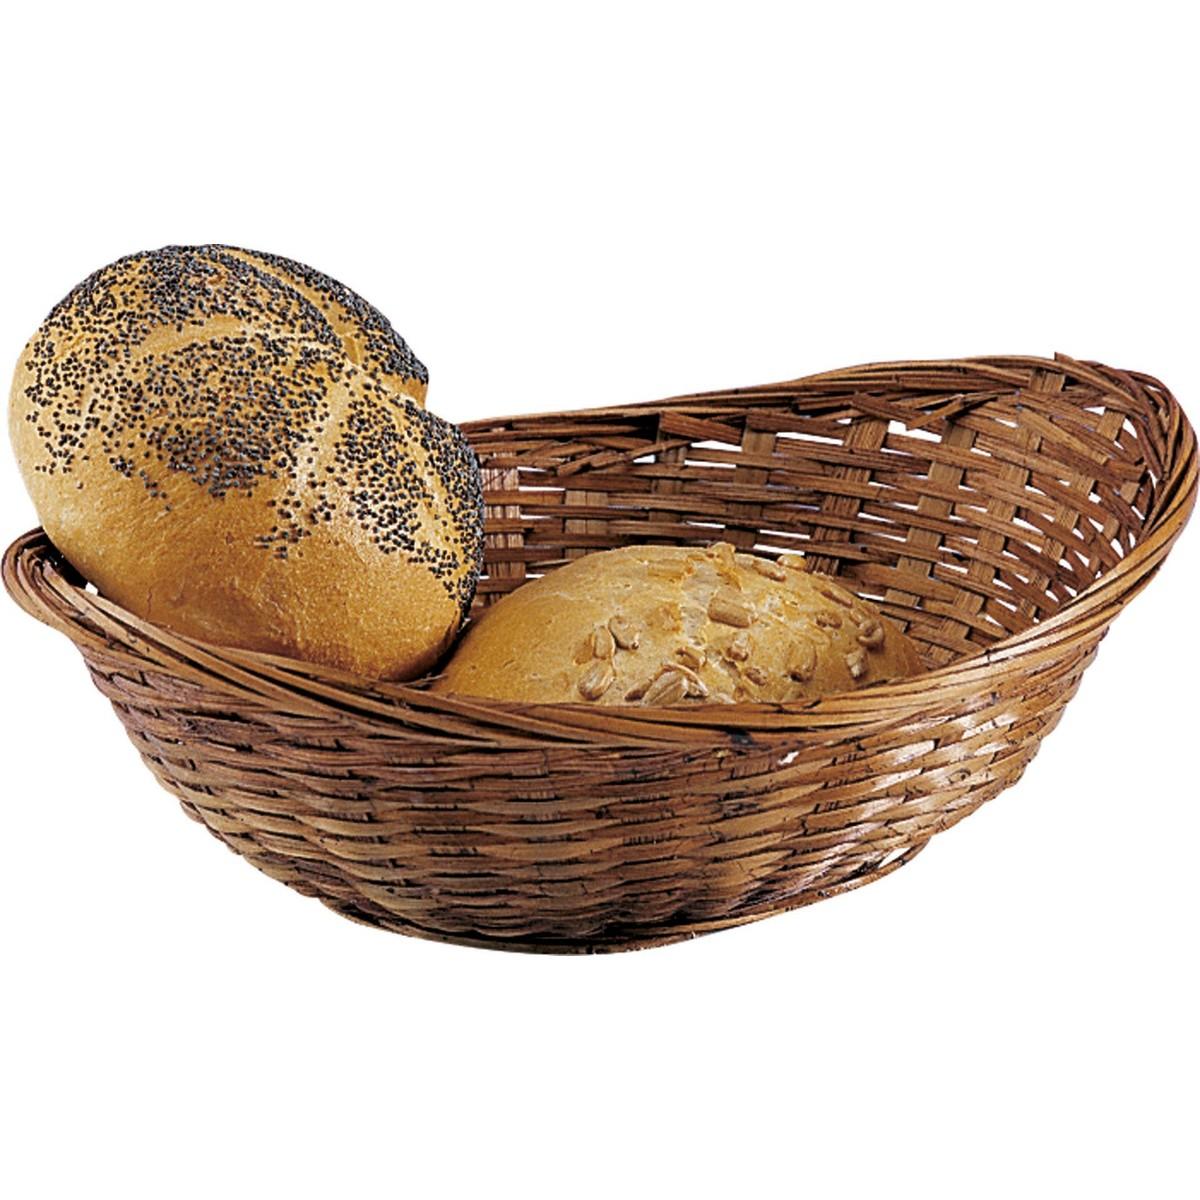 Brot-/Servierkorb dunkel gebeizt